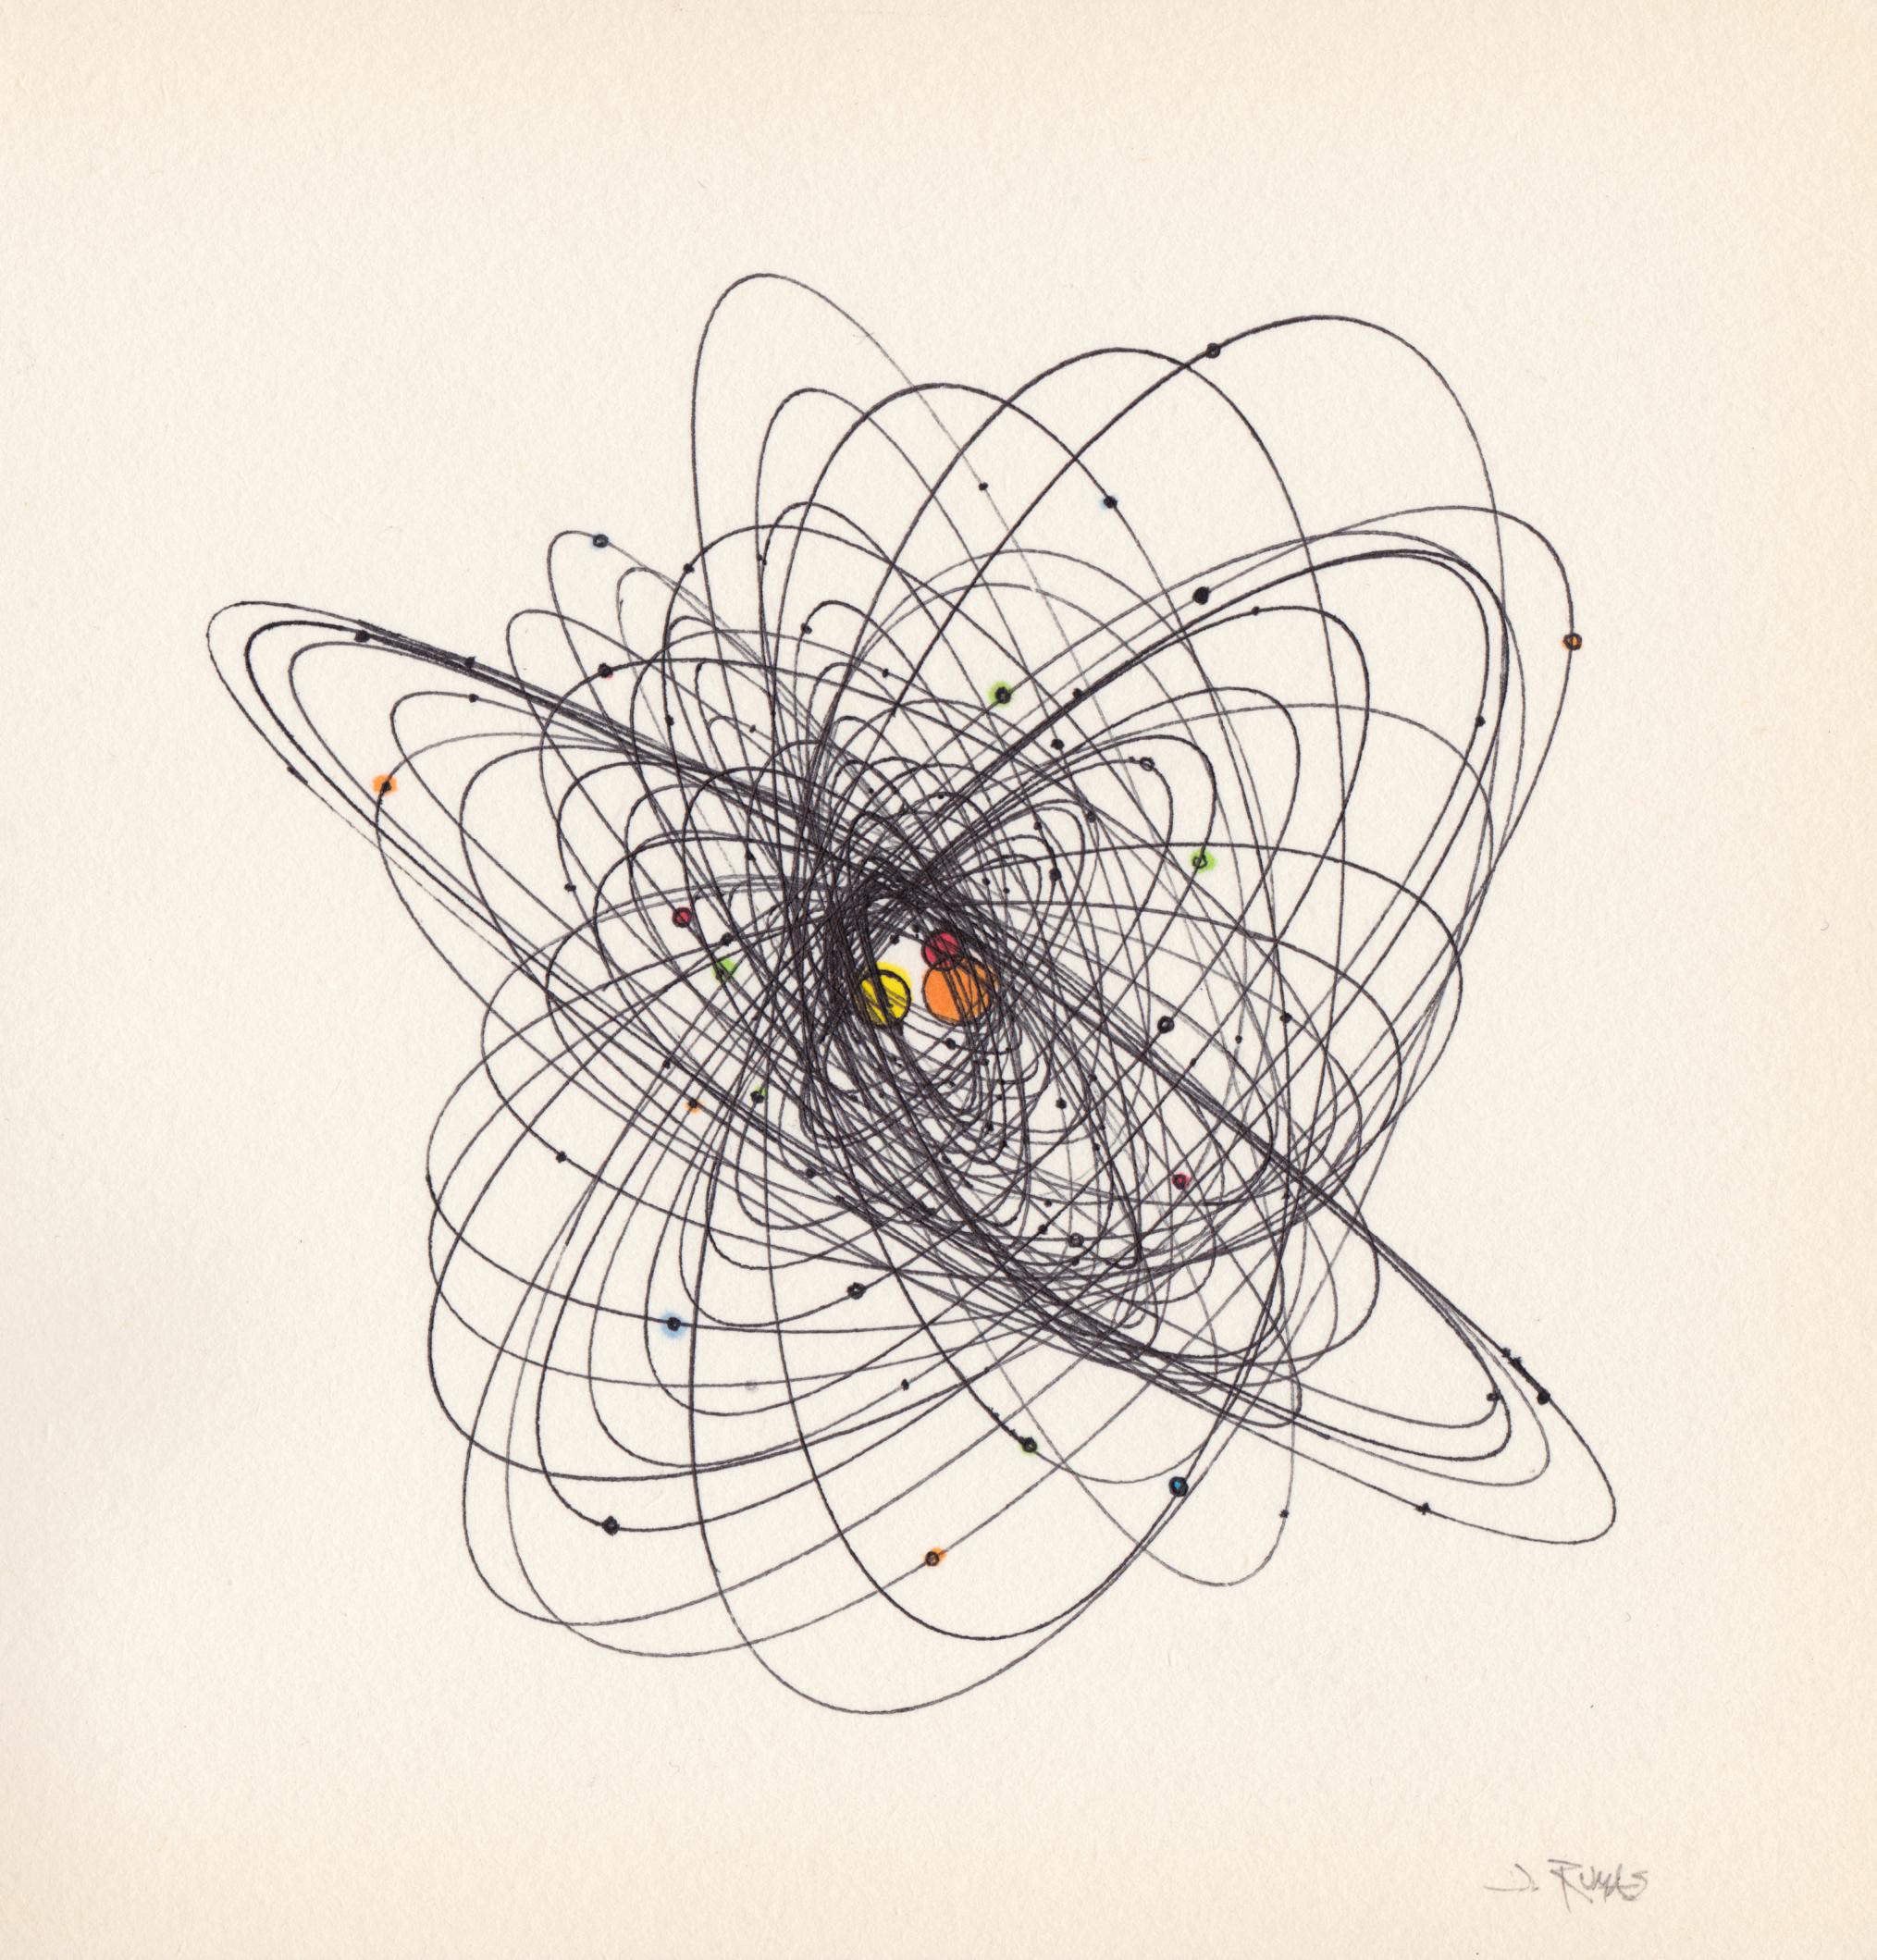 JEREMY RUMAS ART + PEN and MARKER SKETCHES _ ORBIT 04 + space + solar system + futurism + modern art +www.jeremyrumas.com.jpeg